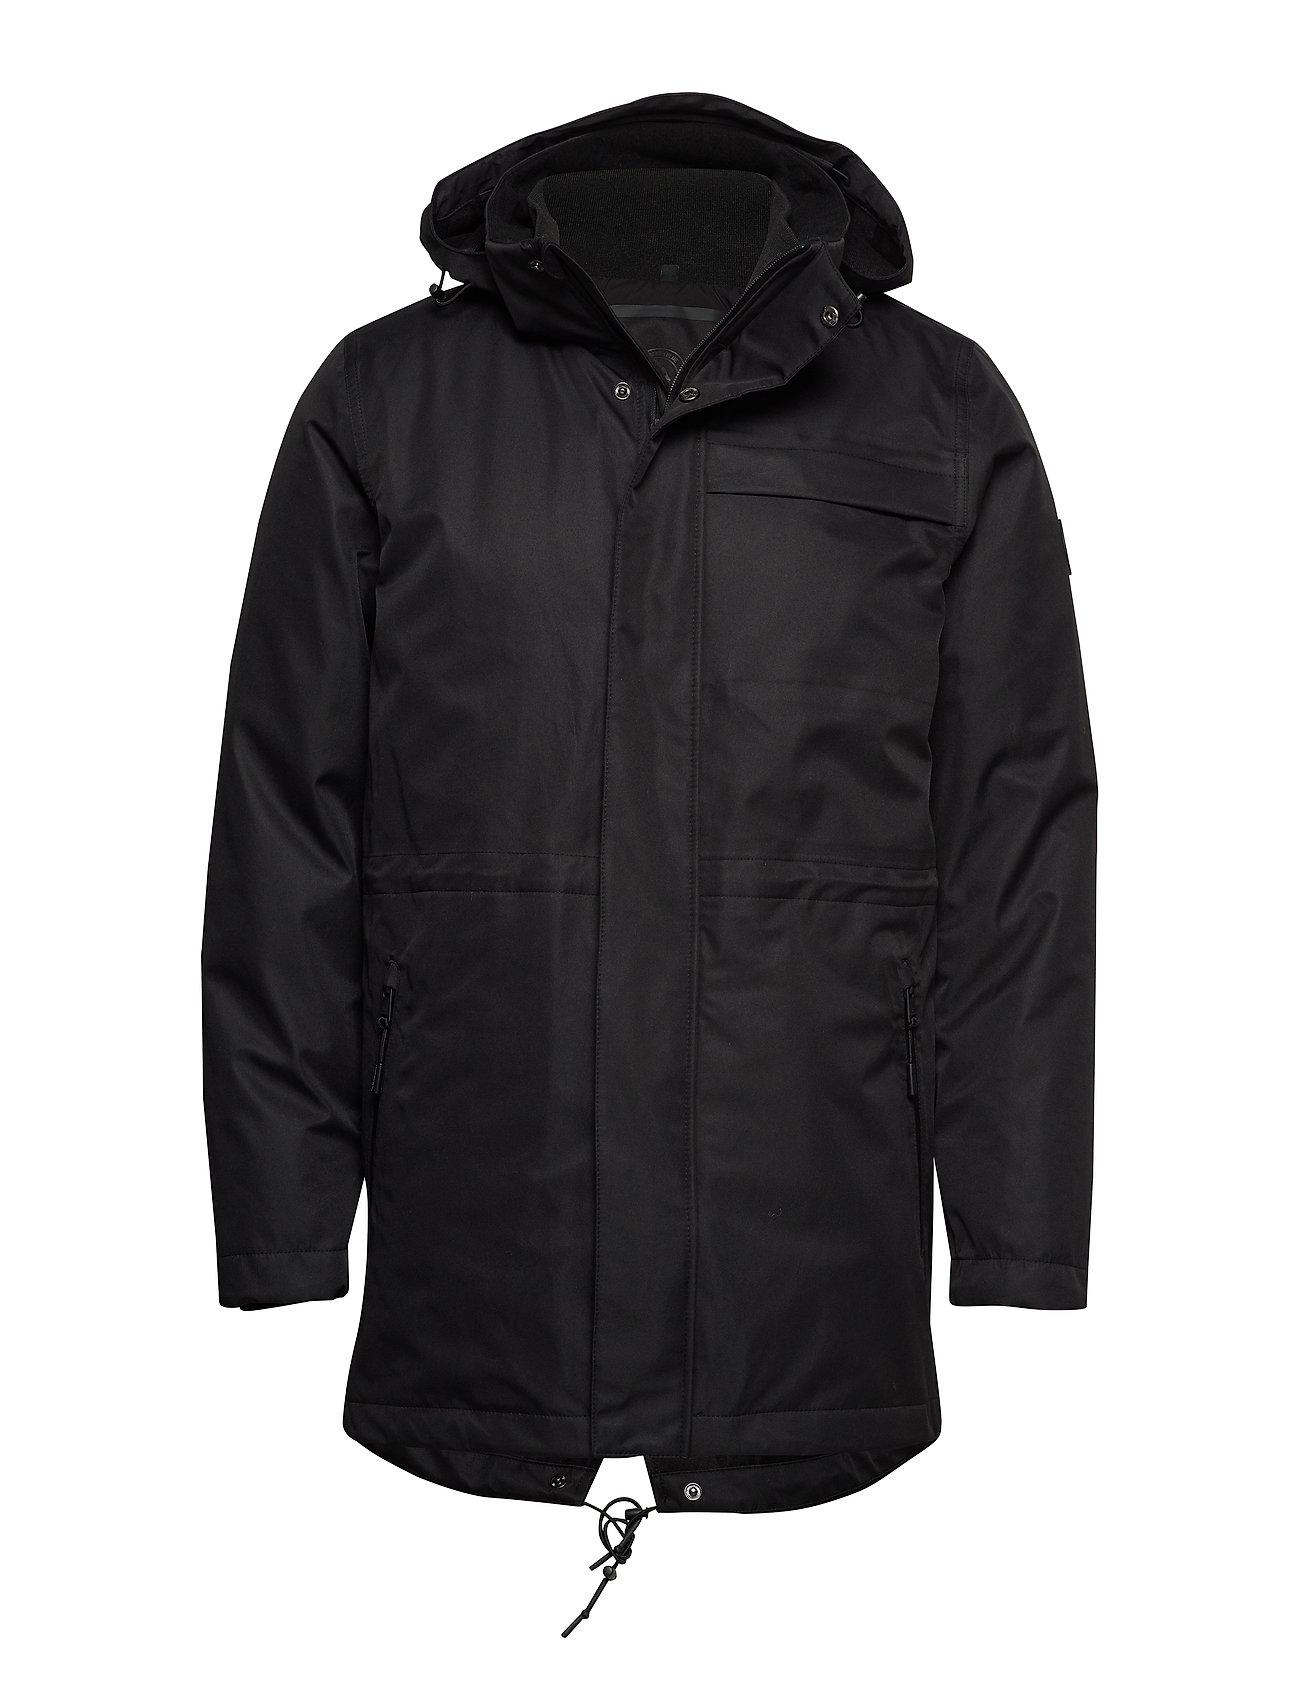 Lindbergh Technical 3-in-1 jacket - BLACK